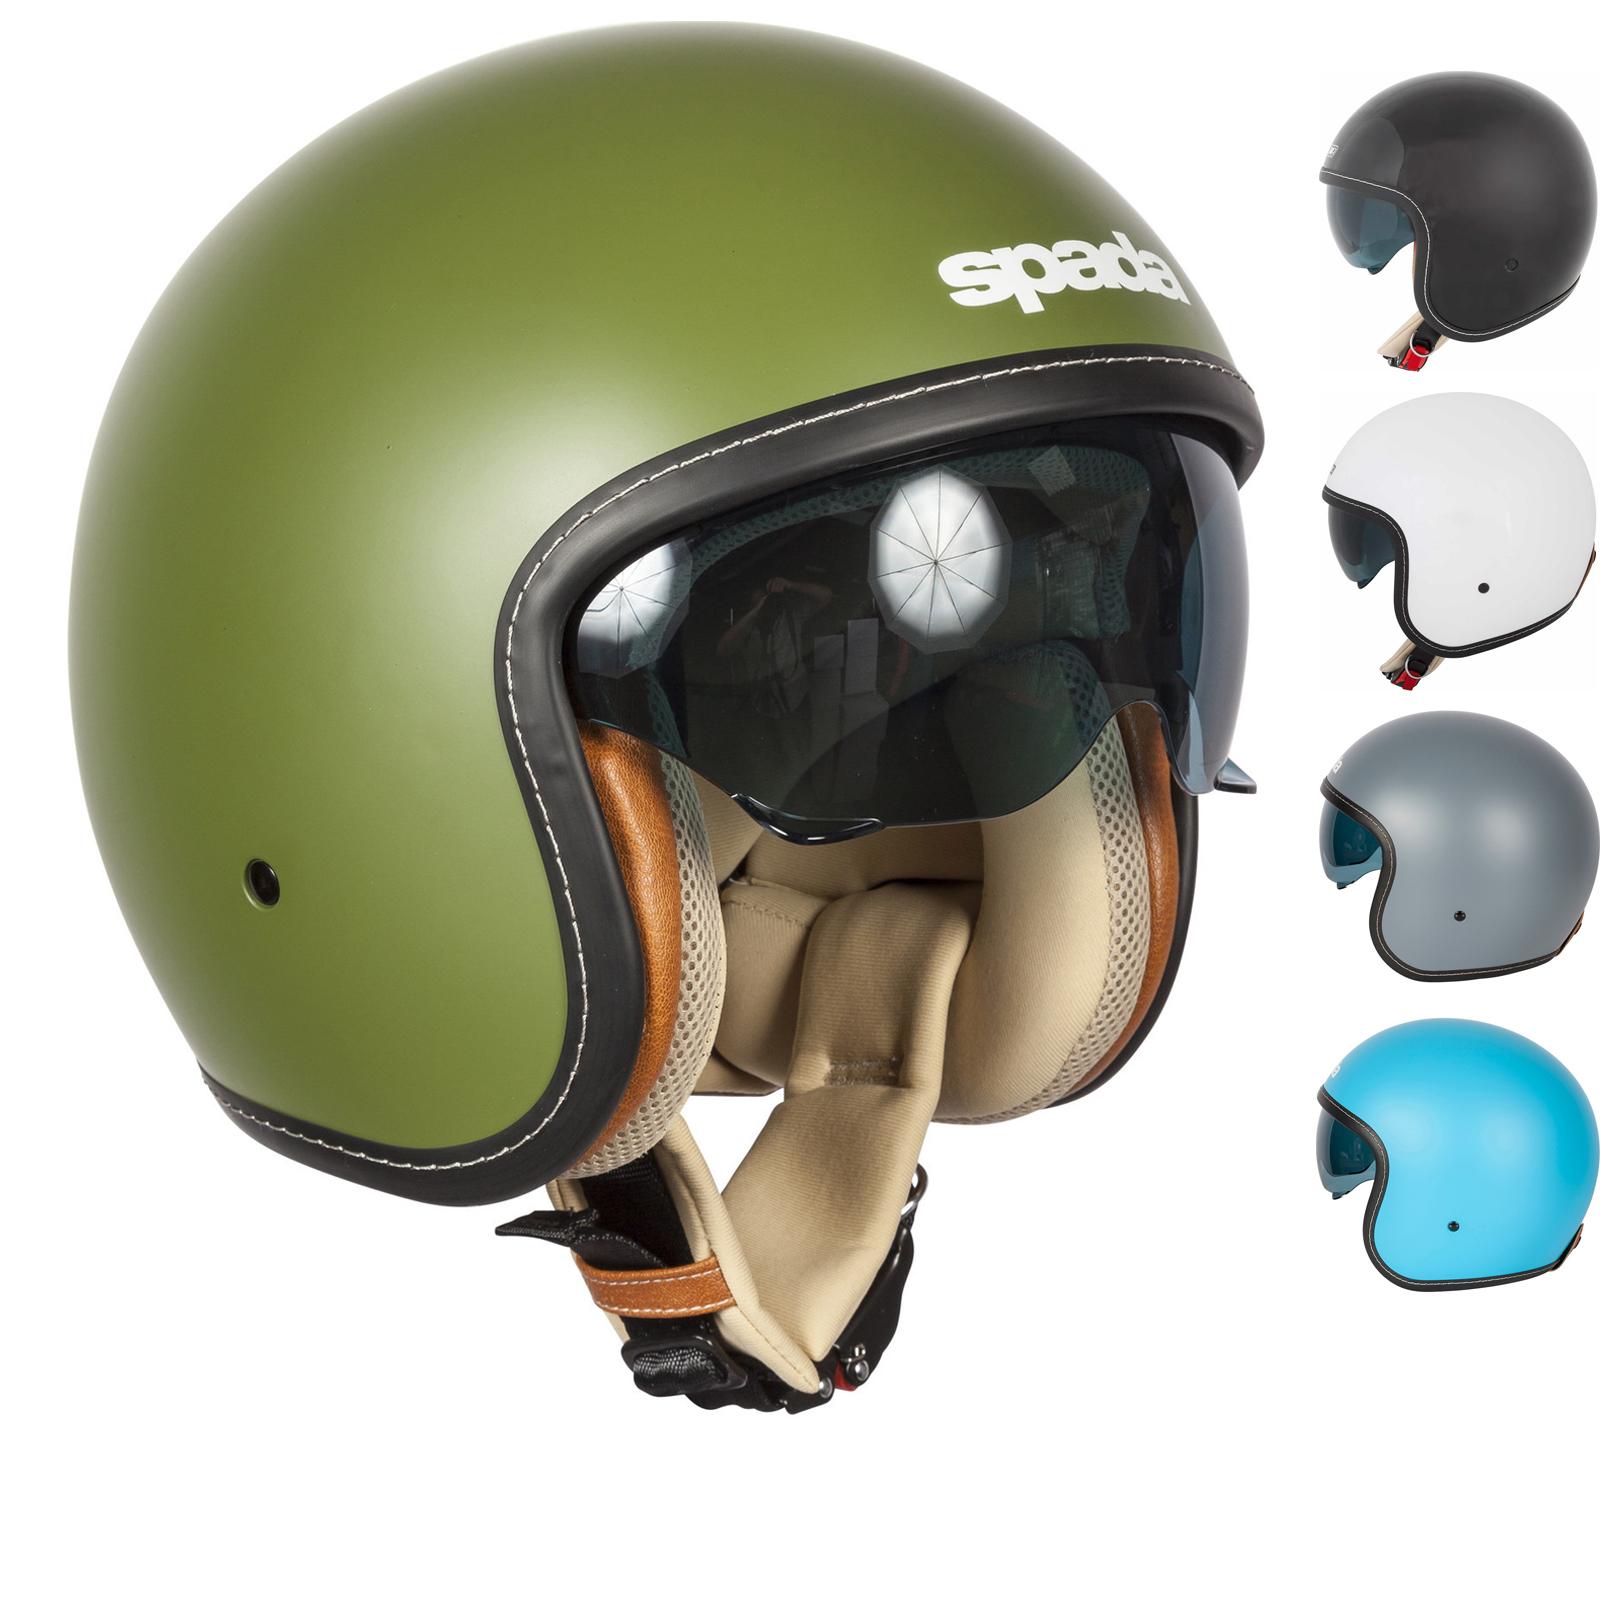 Spada Raze Open Face Motorcycle Helmet ...